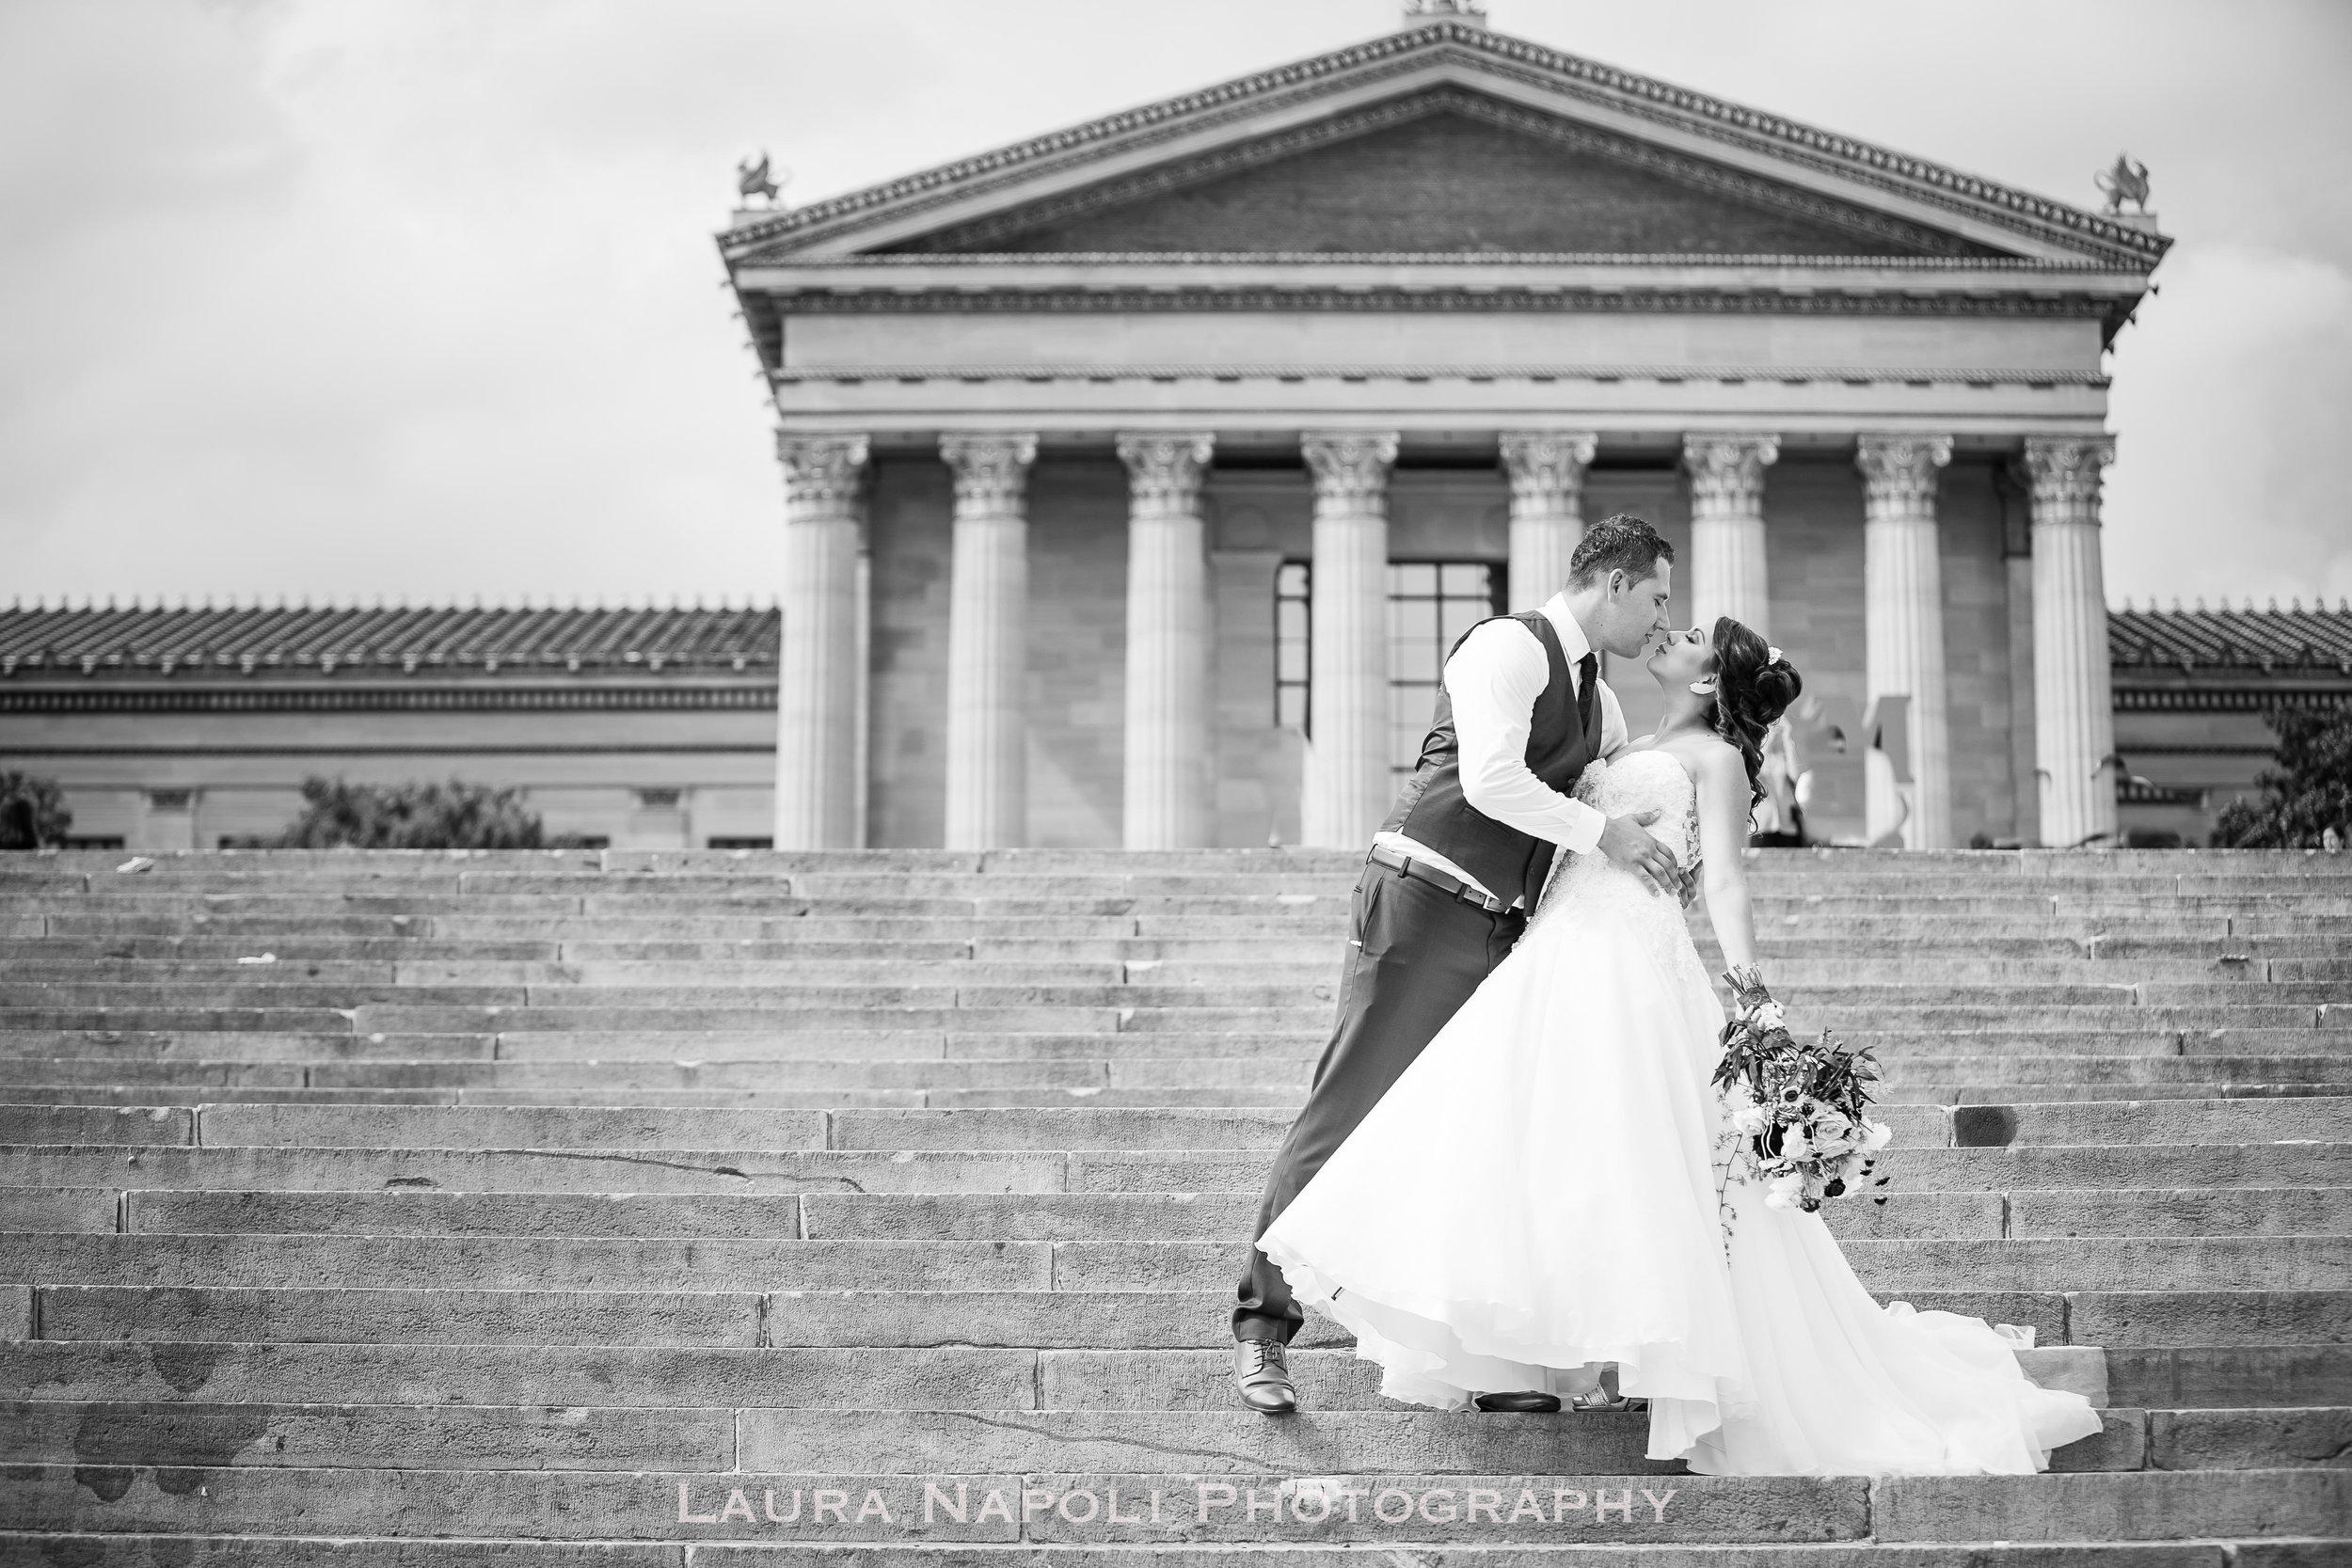 Philadelphiaweddingphotographerartmuseumandcityhallphiladelphiapa-7.jpg